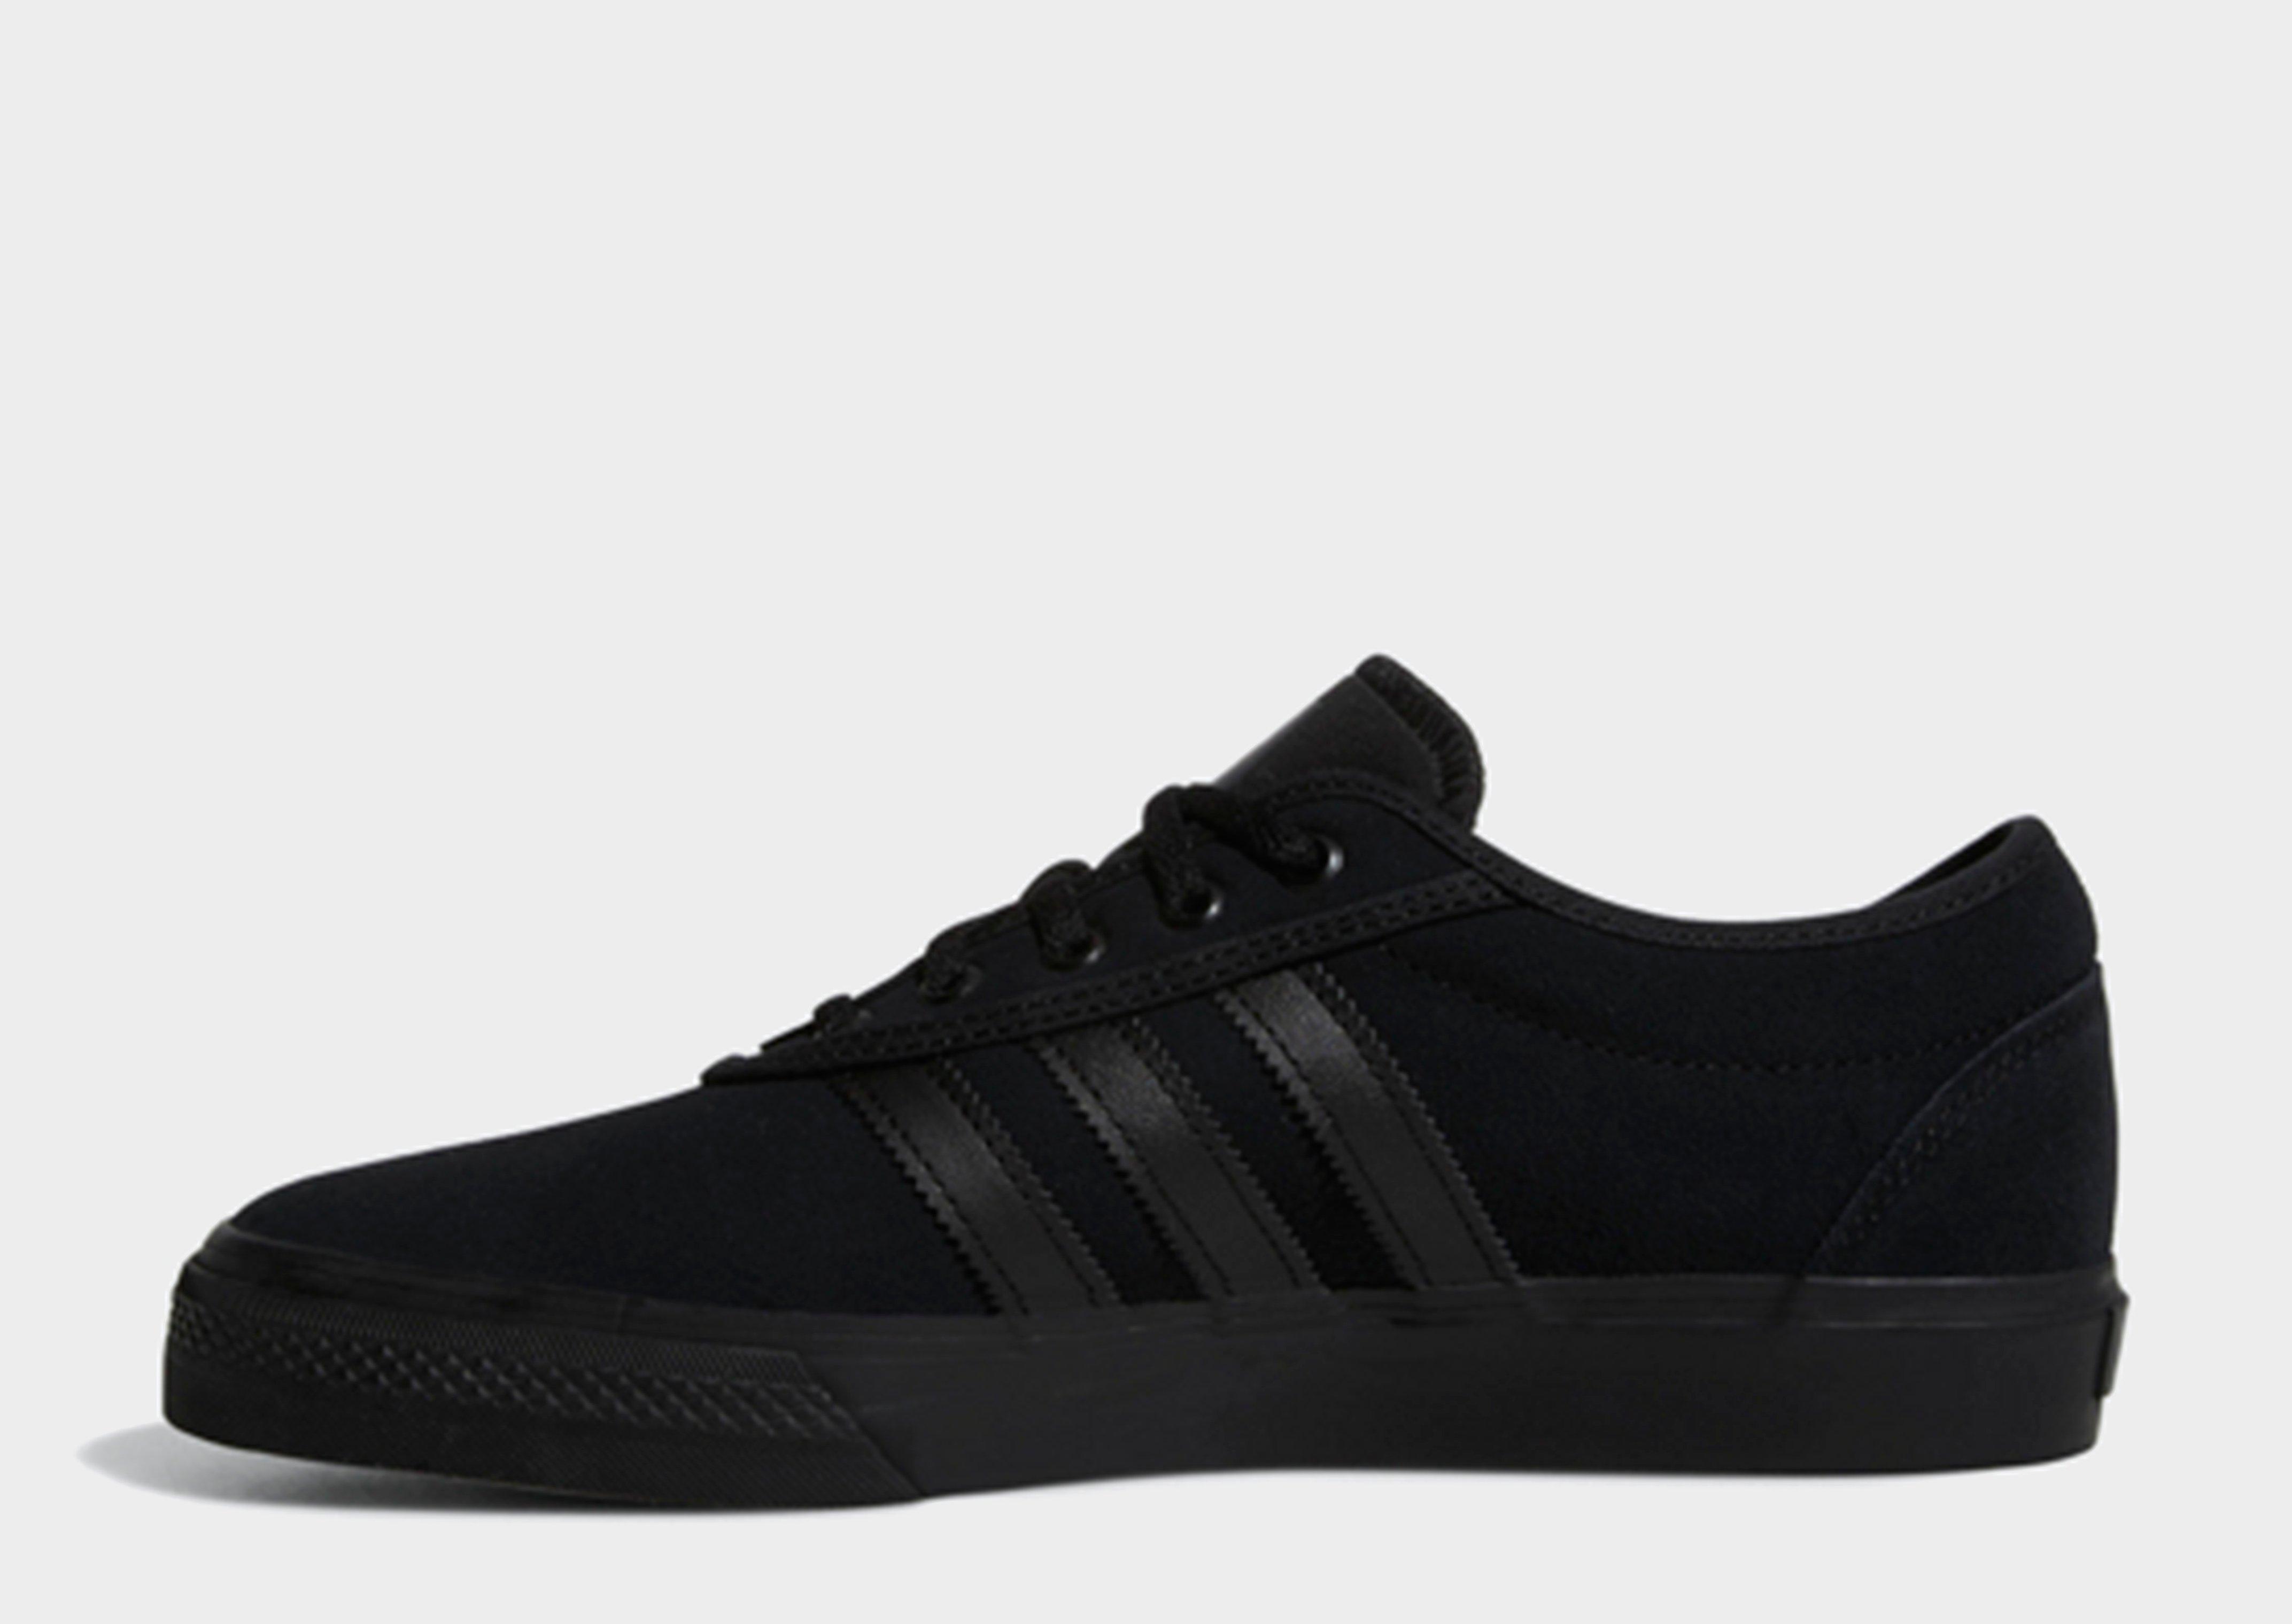 adidas superstar skate black